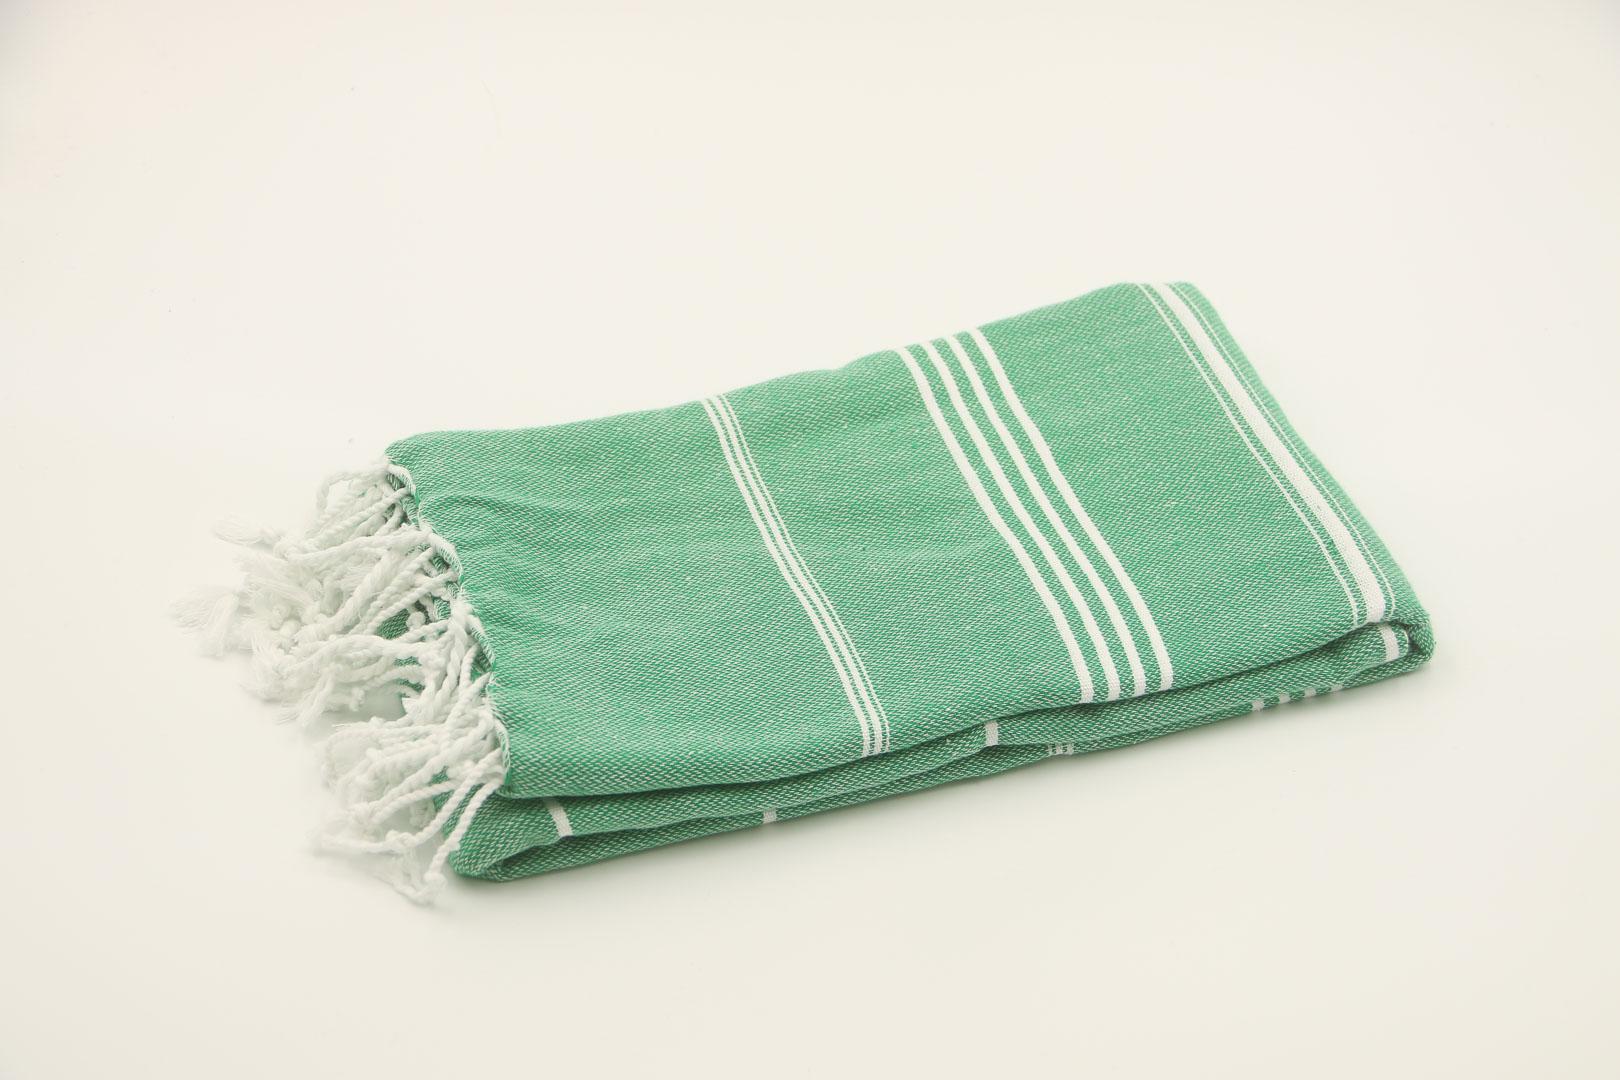 Kylpypyyhe Ranta, vihreä